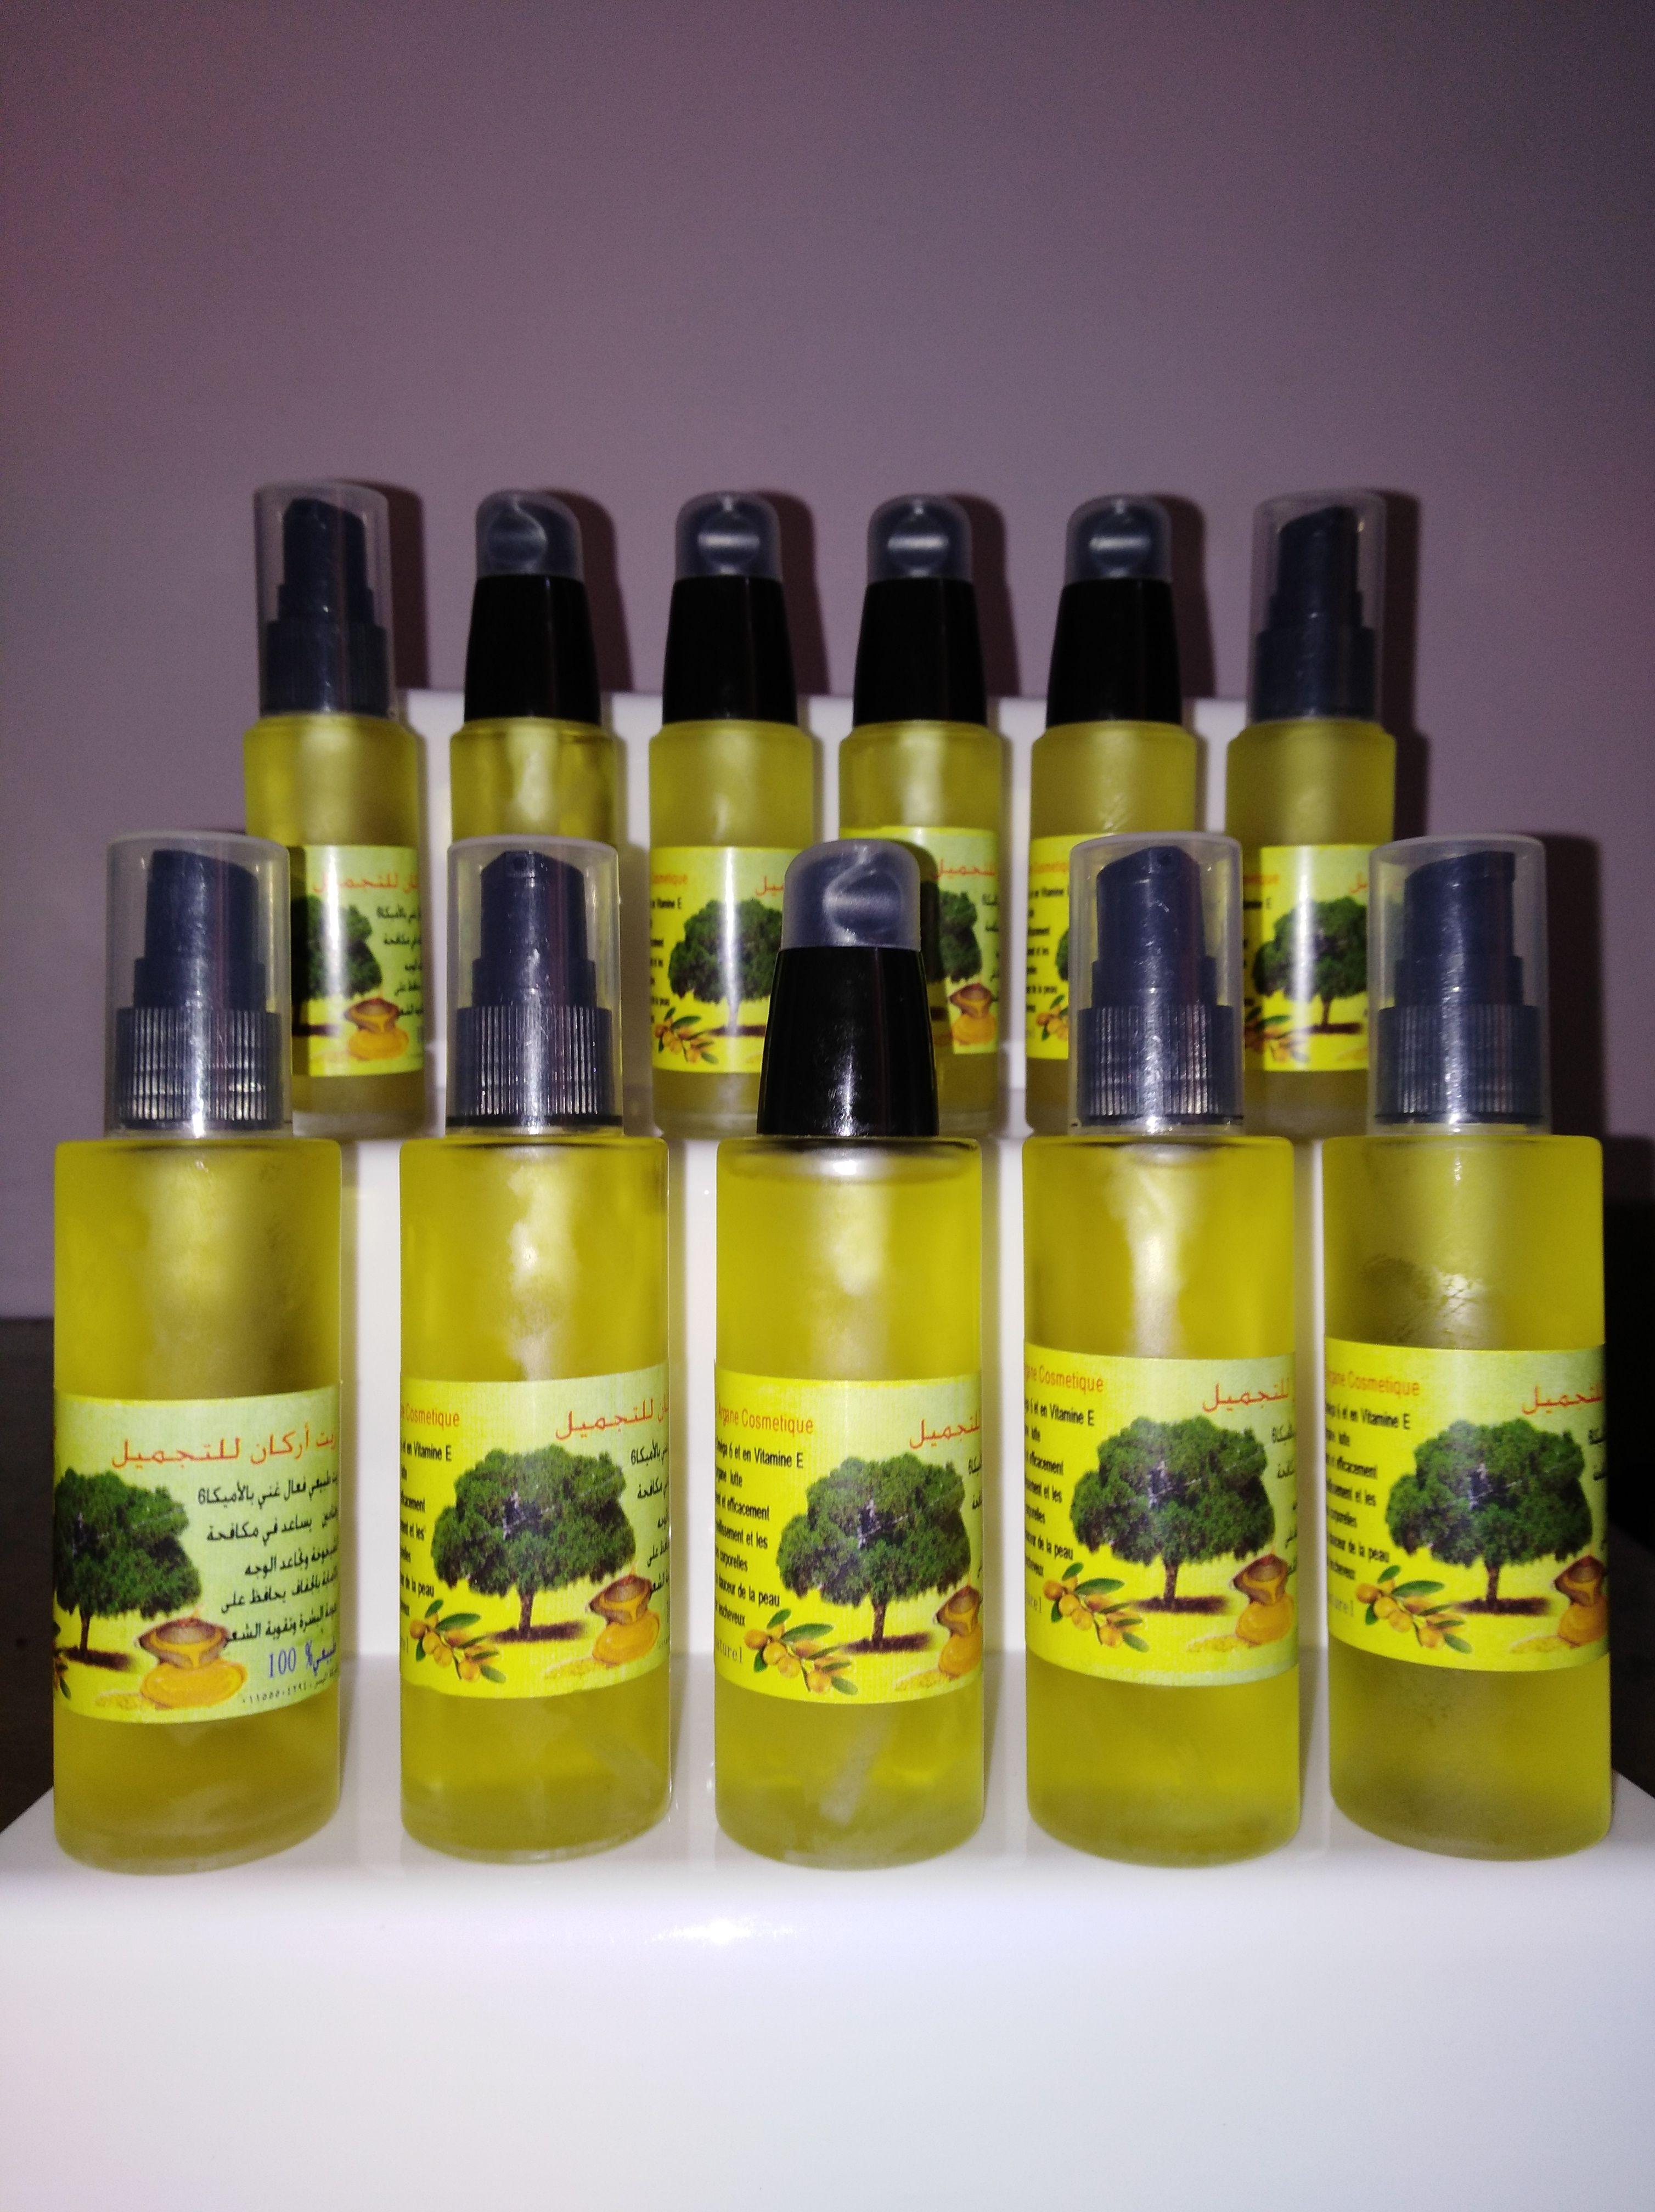 Morocco Argan Oil زيت الاركان المغربي Shampoo Bottle Shampoo Profile Picture